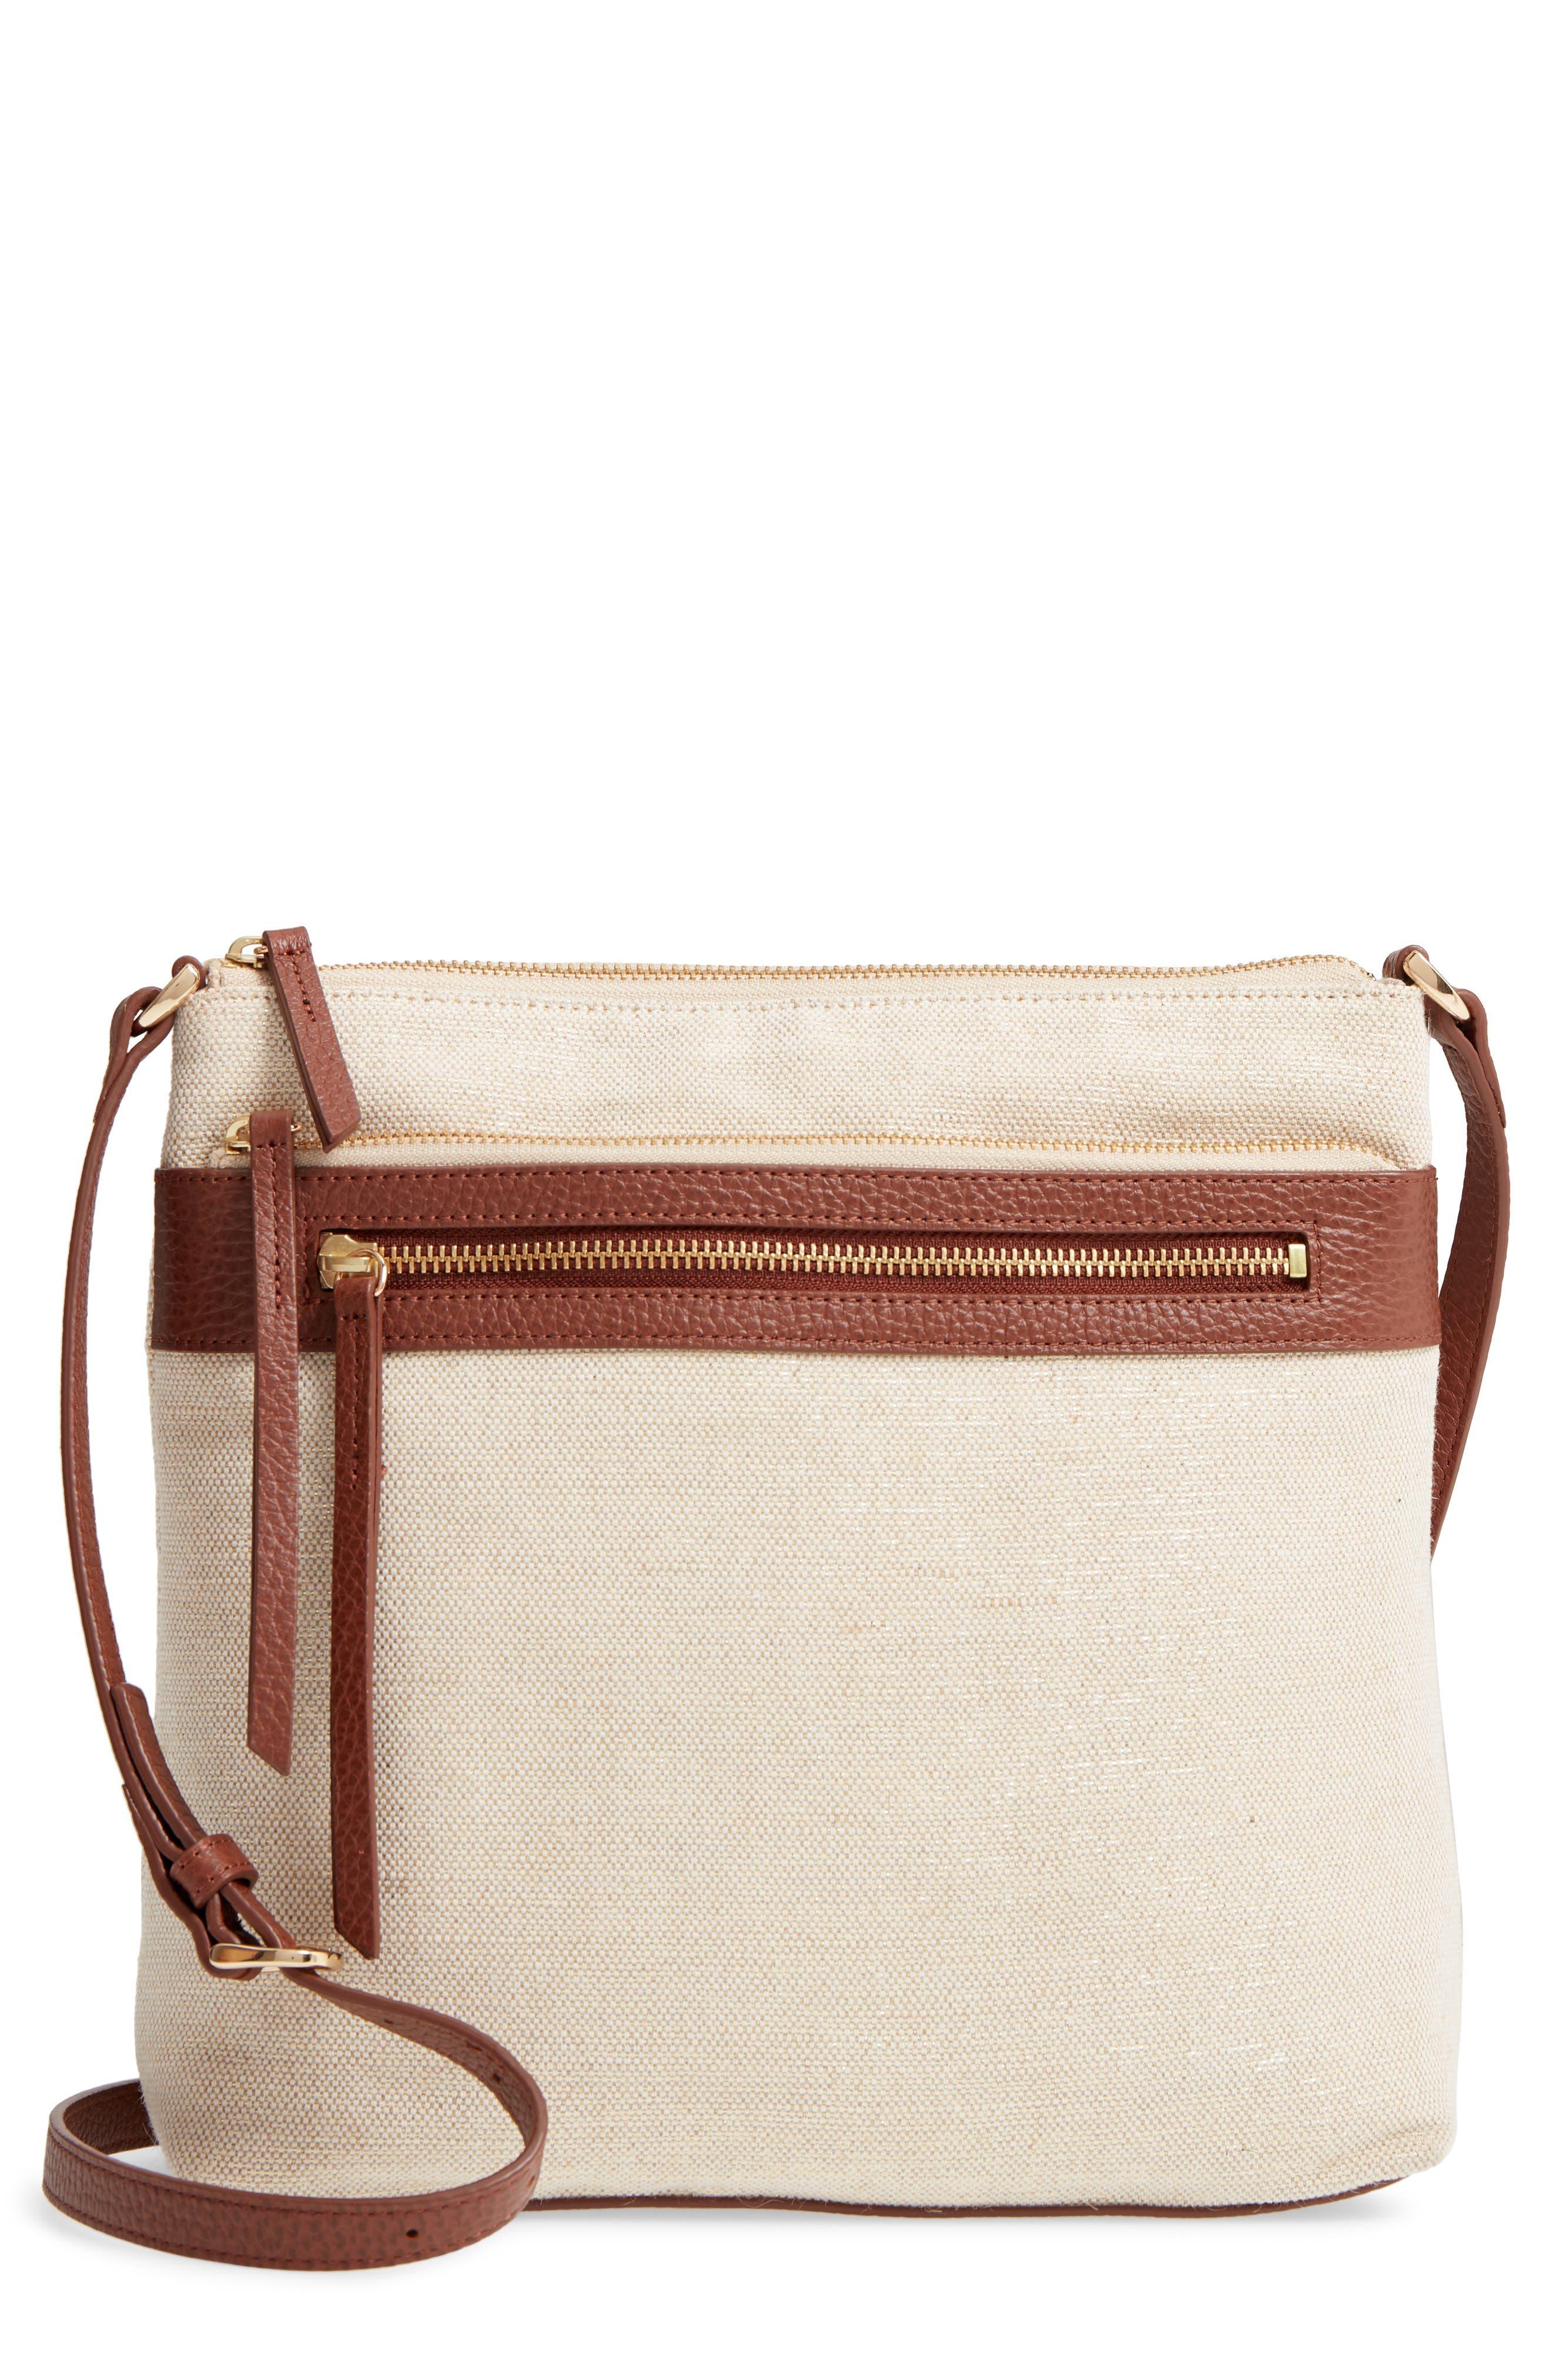 Kaison Linen & Leather Crossbody Bag,                         Main,                         color, NATURAL/ GOLD